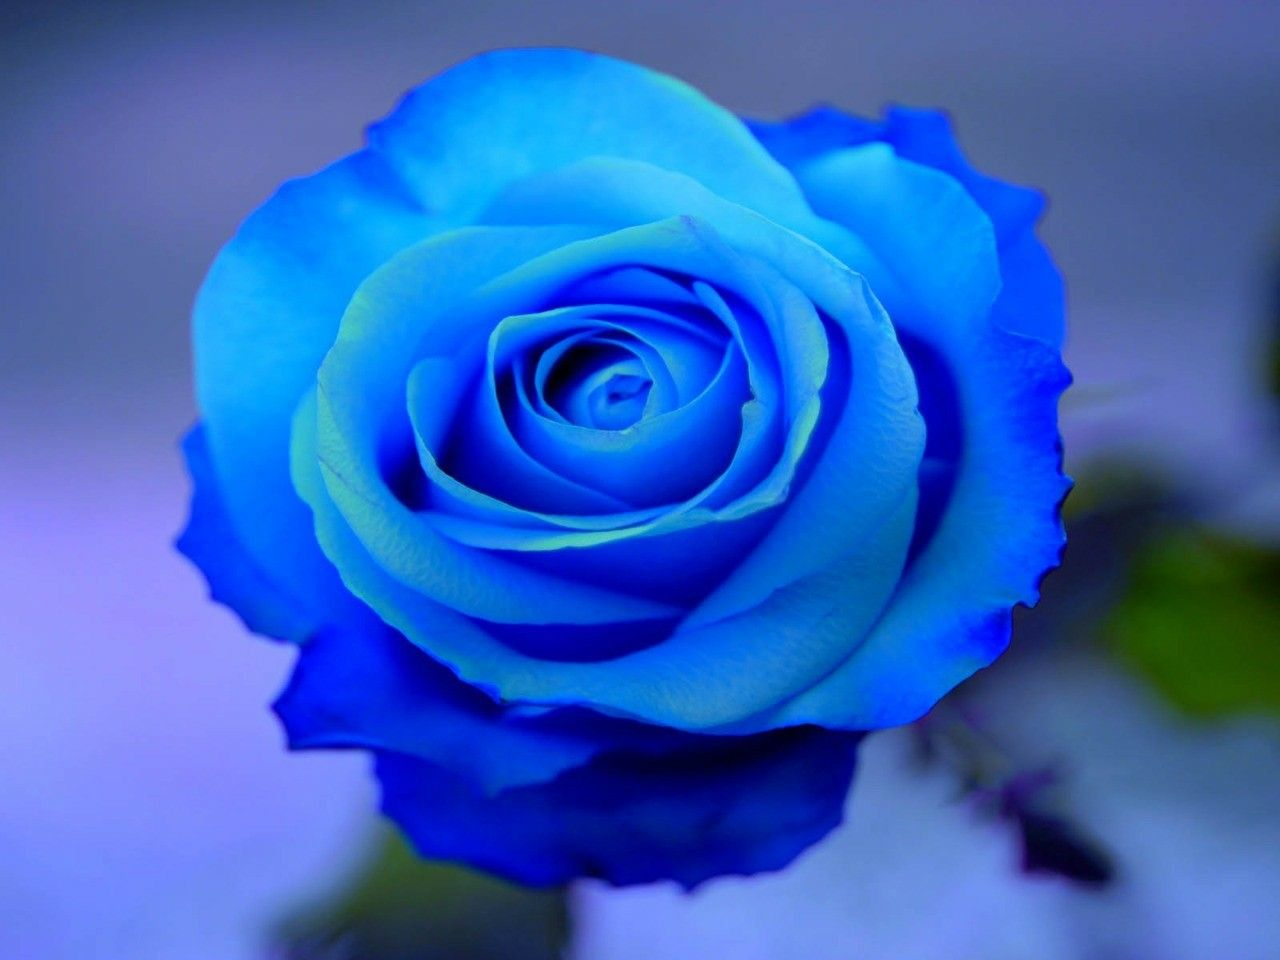 Pin By Paper Goddess On Roses Pinterest